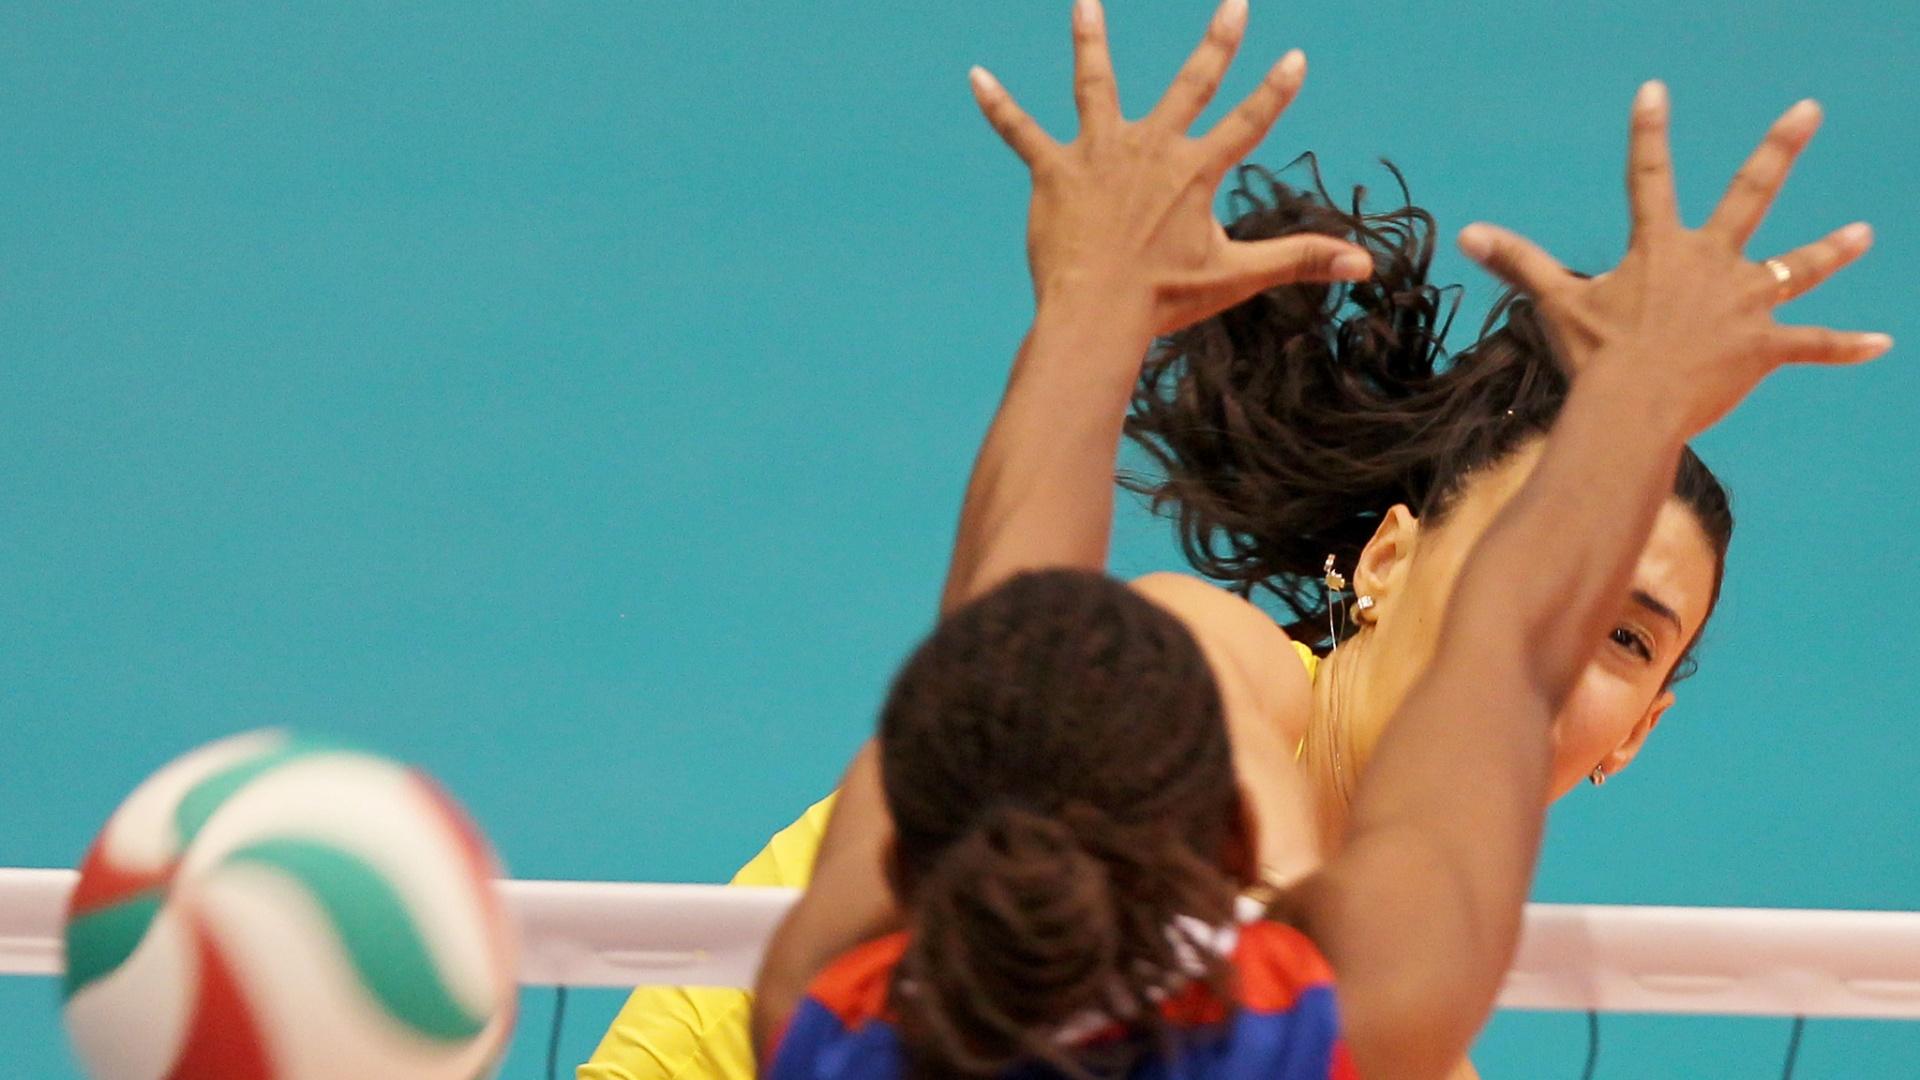 Sheilla supera o bloqueio da cubana Palacio e marca ponto para o Brasil na final do Pan-Americano (21/10/2011)